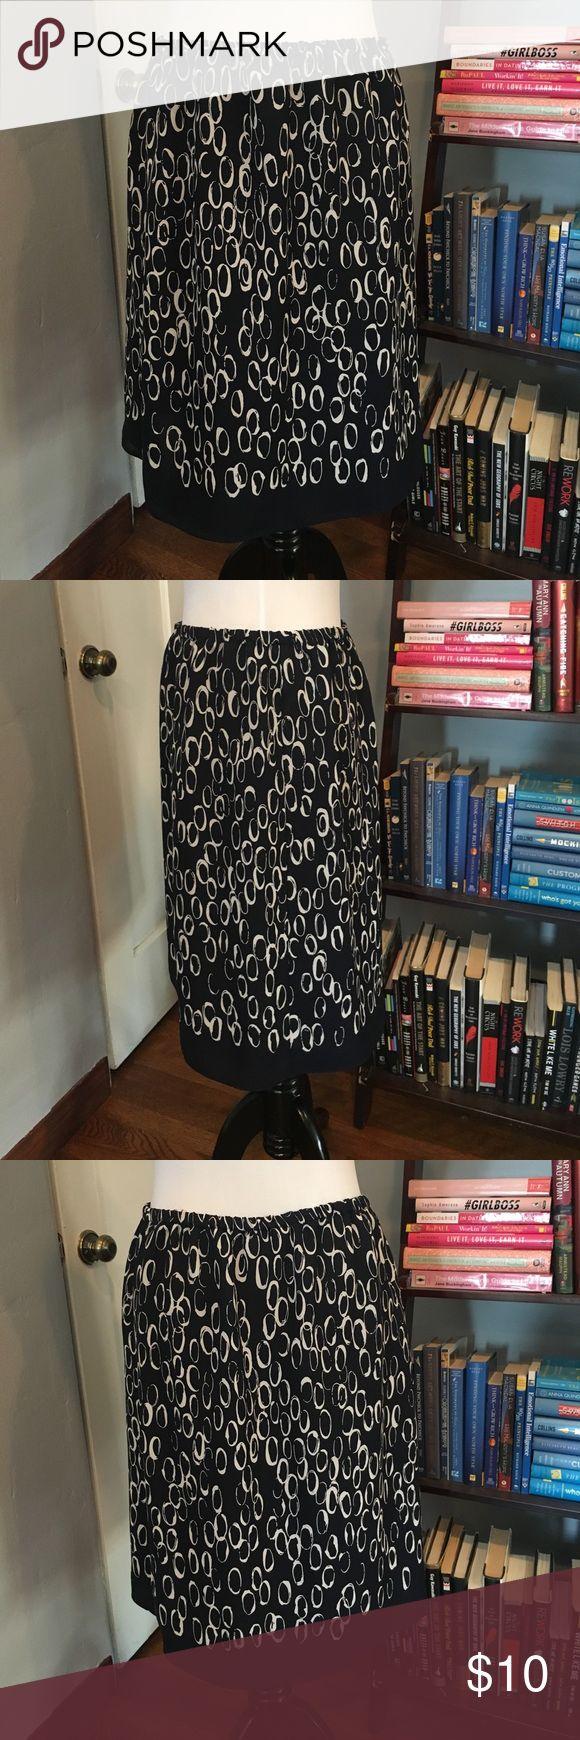 Liz Claiborne Black and White Circle Skirt Simple, circle skirt with a beautiful circle pattern. Elastic waistband and black trimming. EUC Liz Claiborne Skirts